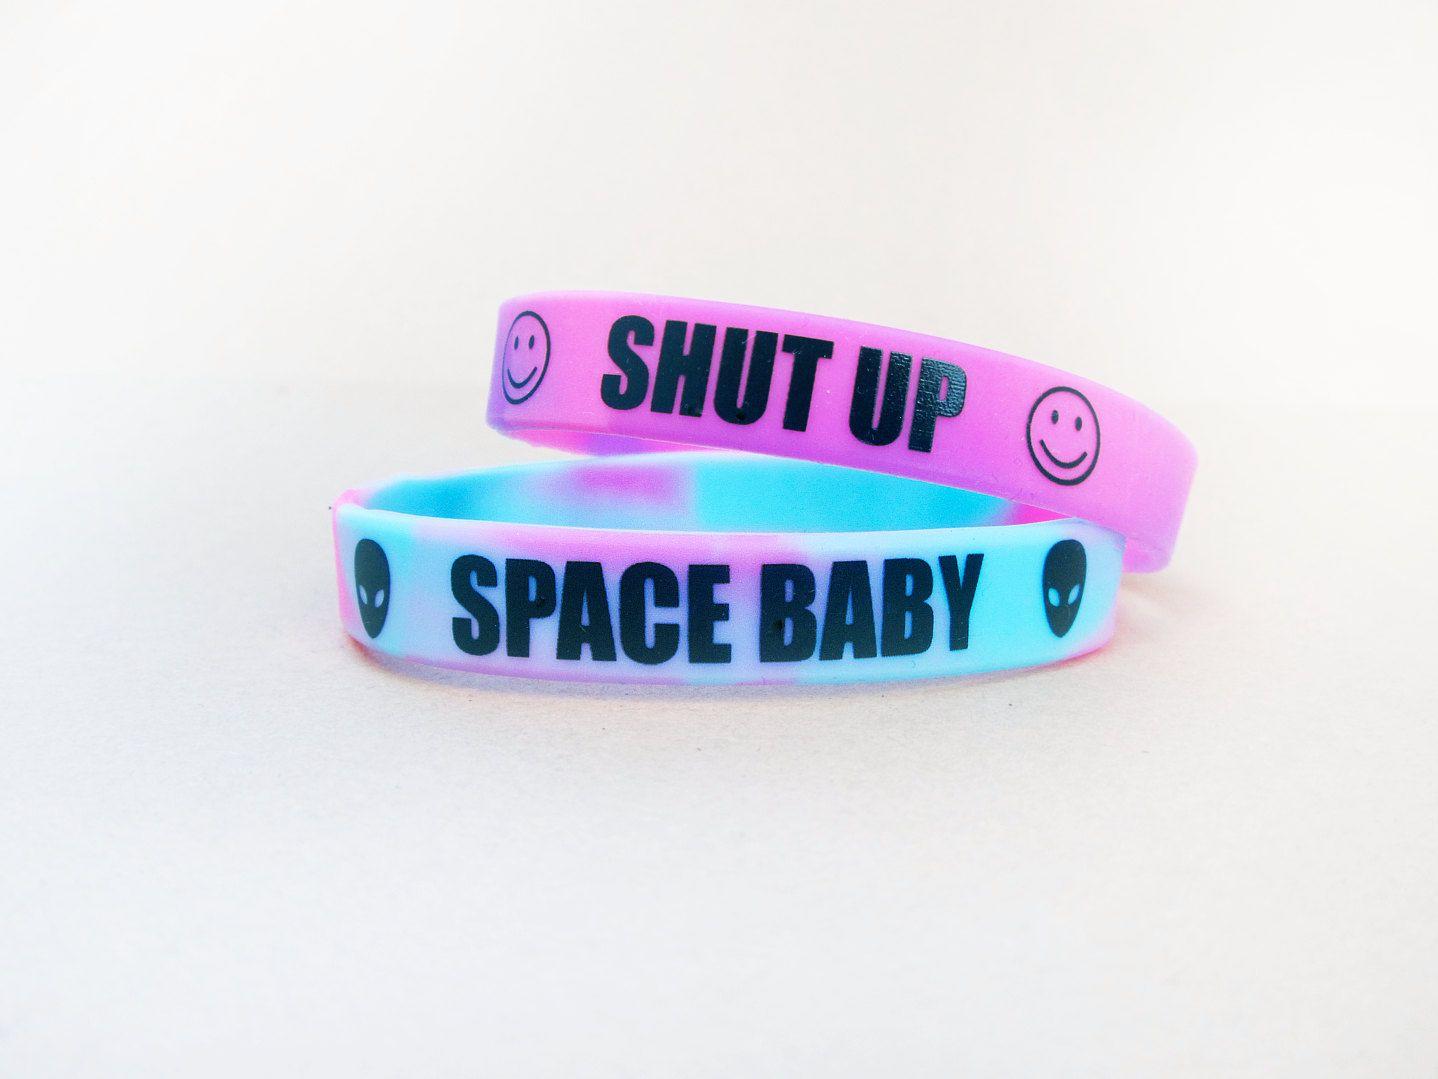 Pastel Grunge Bracelet // Alien Smiley Face Bracelet // Soft Grunge // Pastel Goth // Shut Up Bracelet // Space Baby Bracelet // 90s Hippie pastel grunge pastel goth 90s grunge sassy grunge jewelry psychedelic alien jewelry alien kawaii bracelet smiley face emoji soft grunge shut up 5.99 USD #goriani